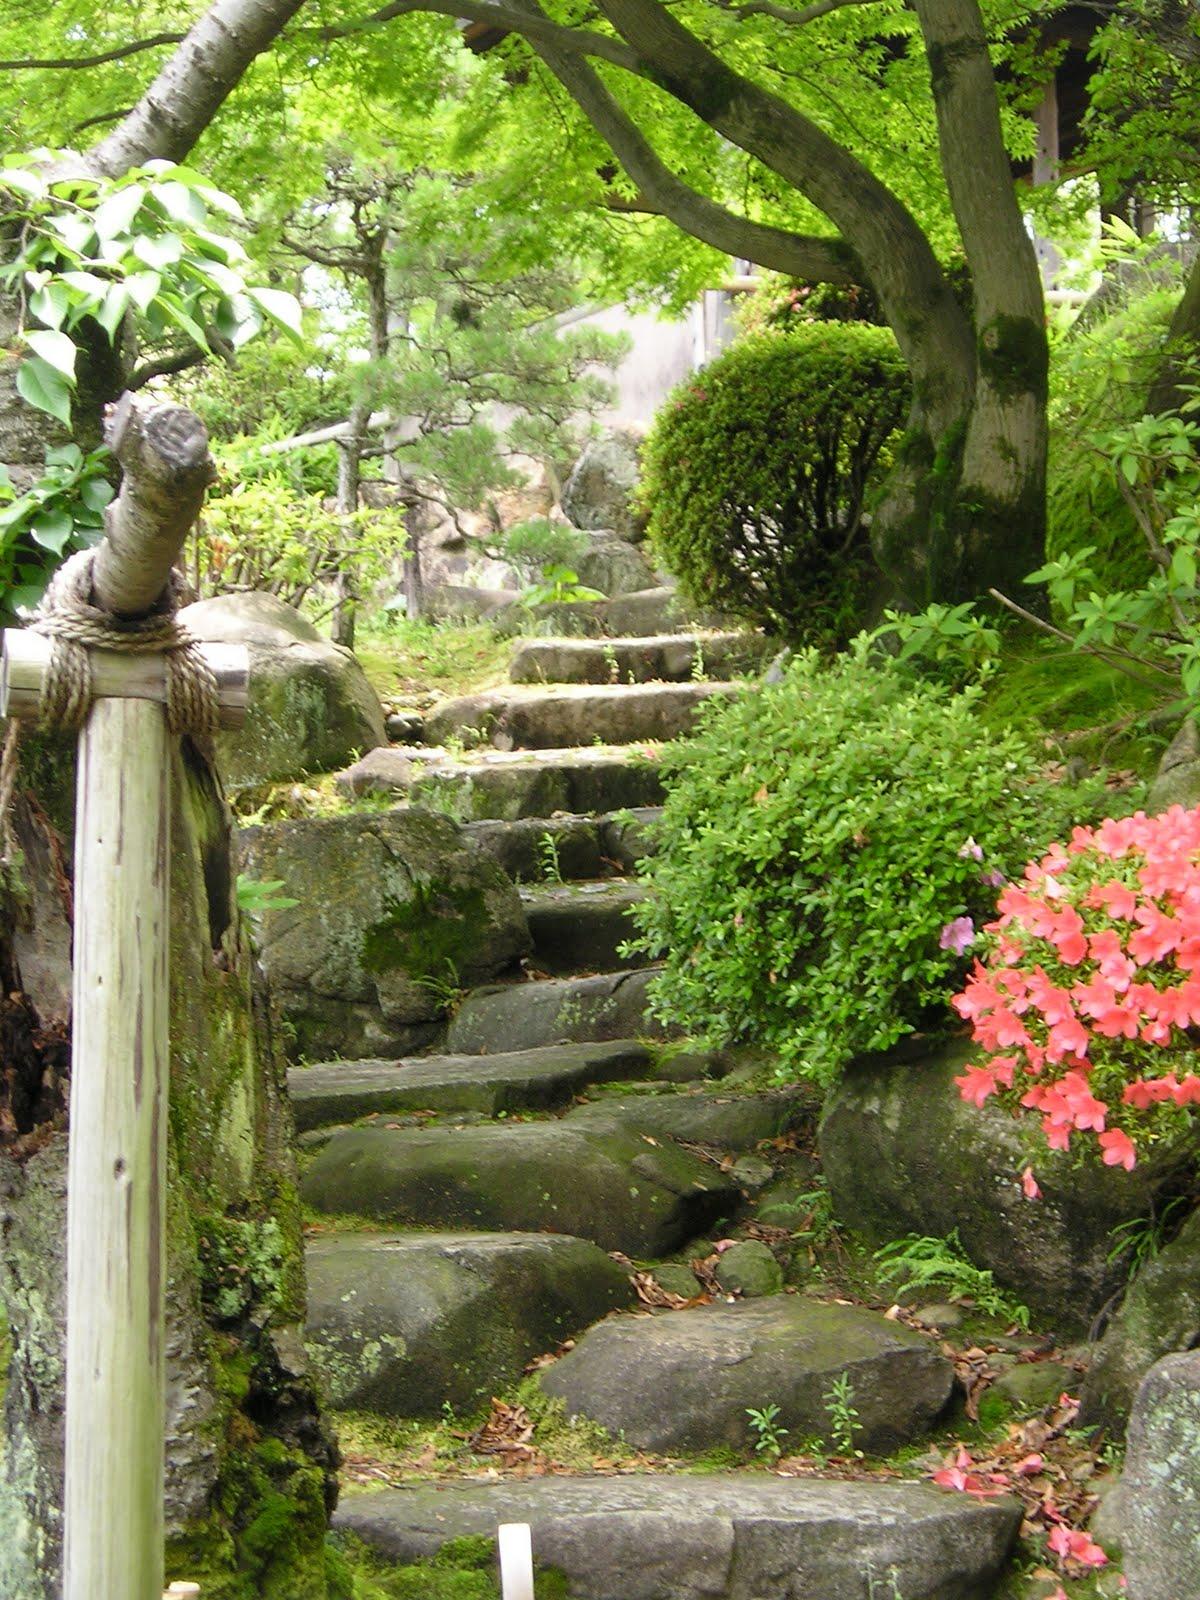 Backyard Pretty Garden: The Quest For All Knowledge: Japan Has Pretty Gardens